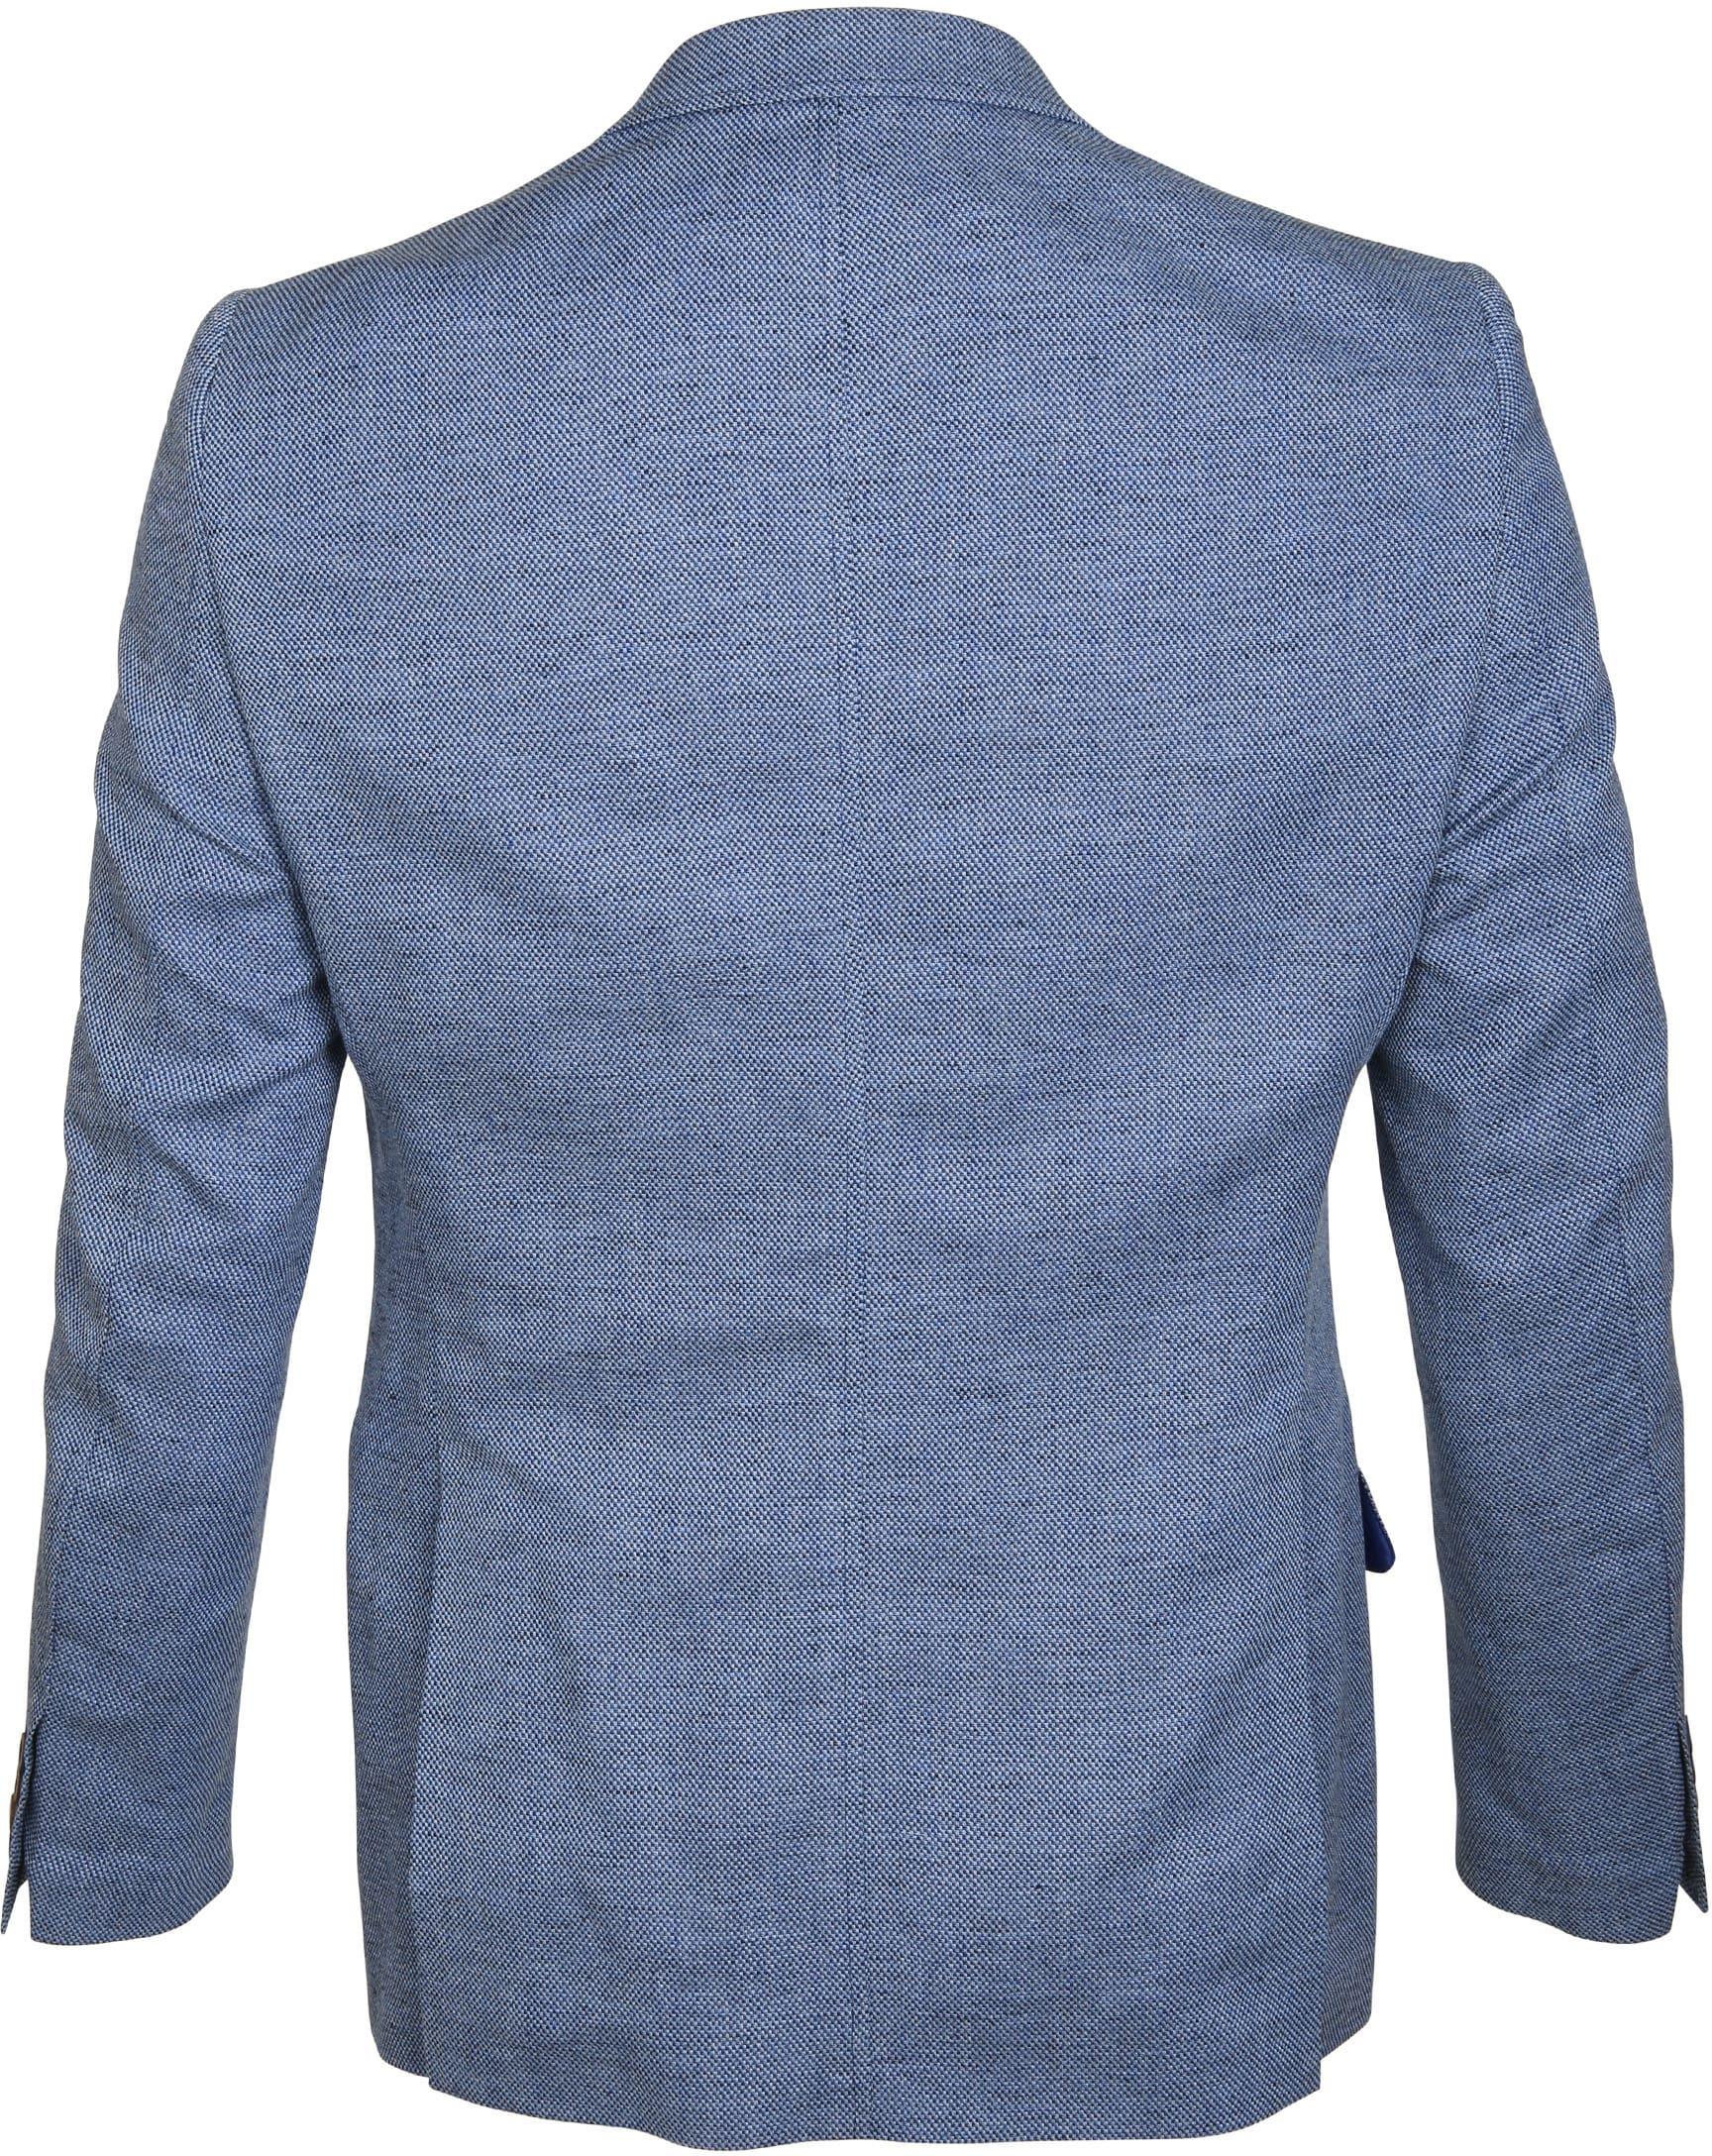 Suitable Blazer LeLuc Blau foto 3